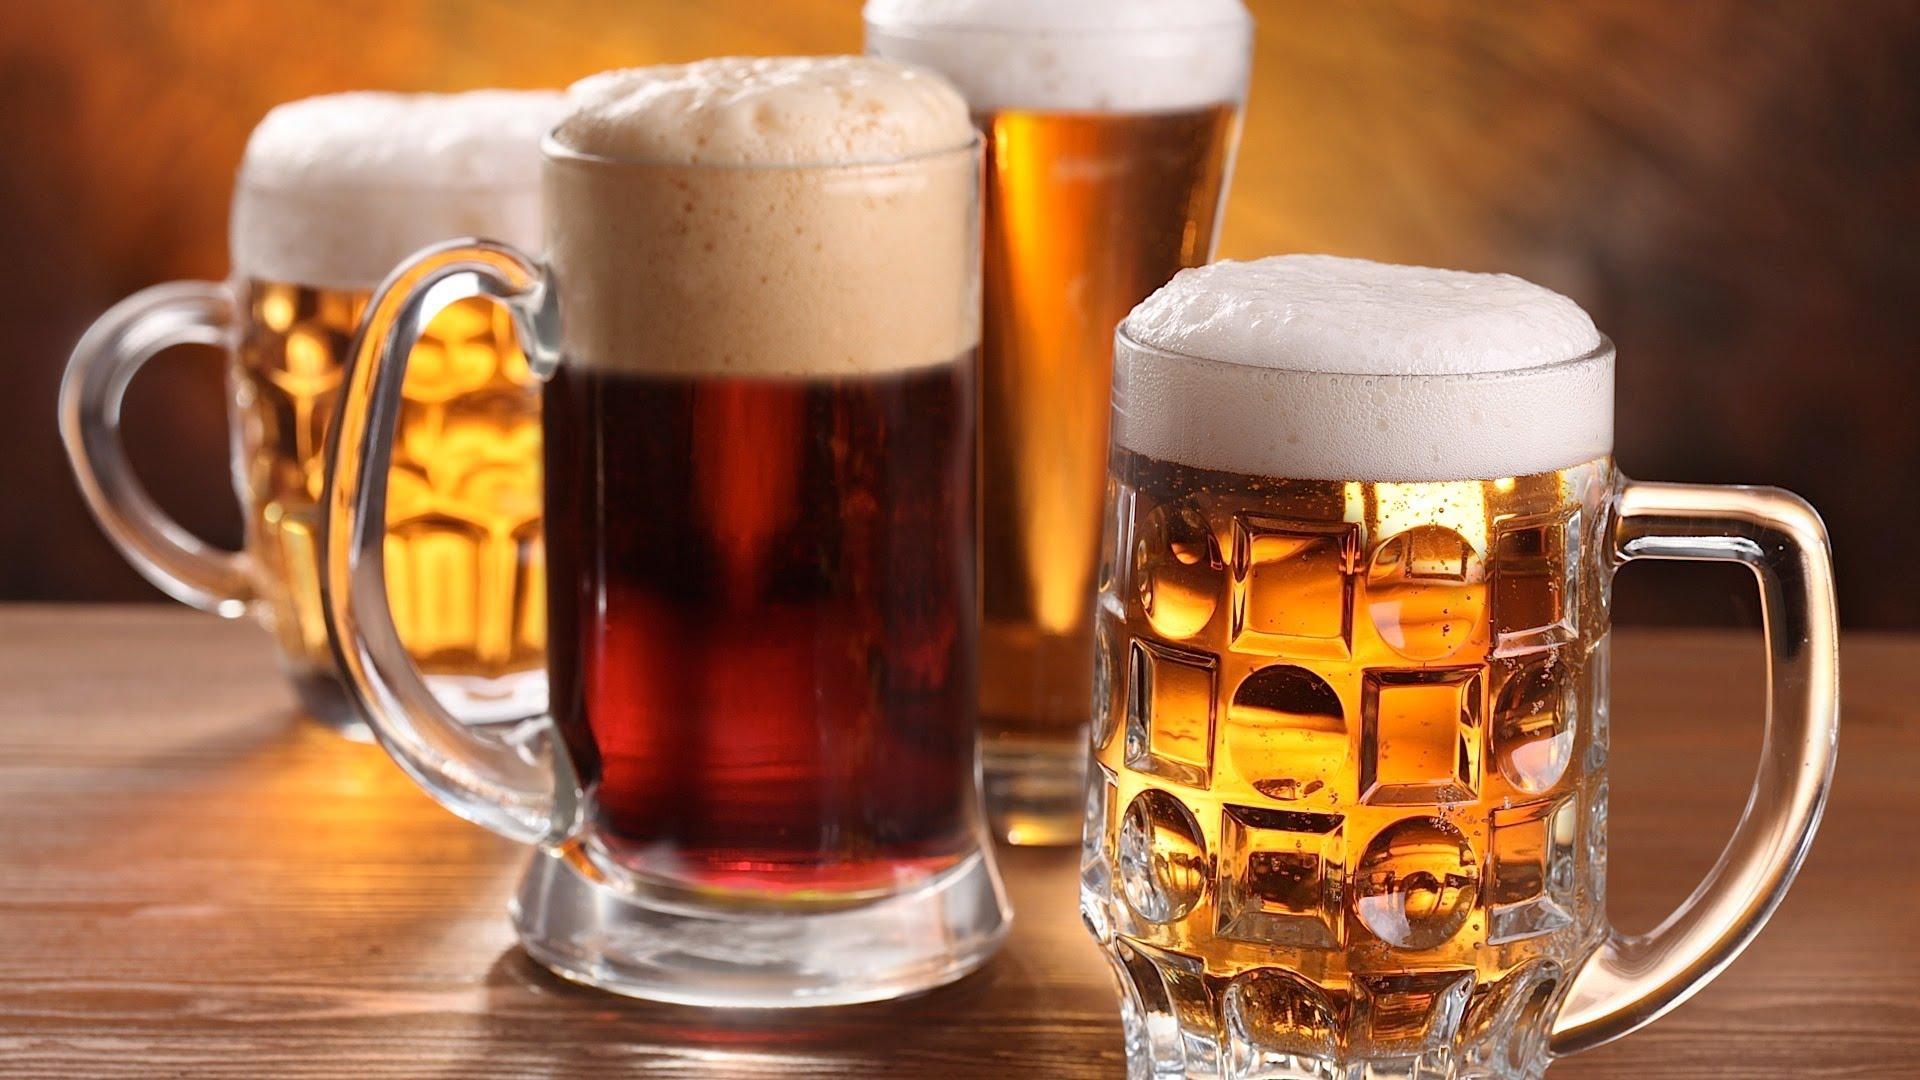 magas vérnyomás a sörből)